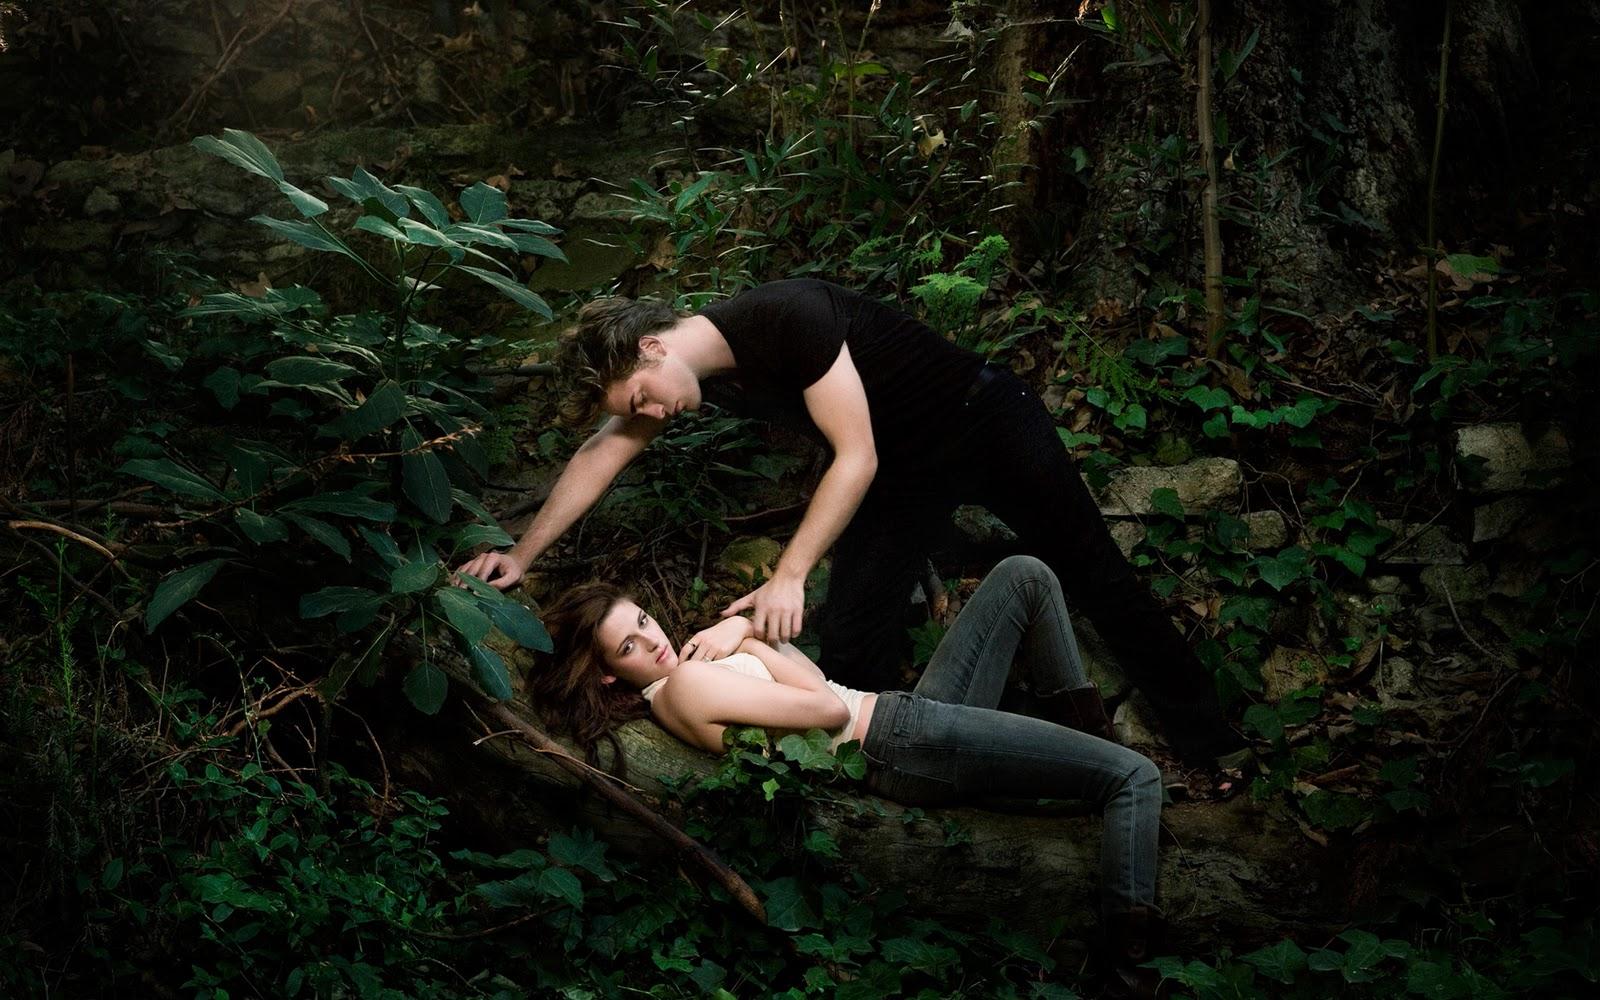 http://3.bp.blogspot.com/-h0yaQN2ROIg/TkN0EQ0ItjI/AAAAAAAAC6Y/BSrKThzOzE8/s1600/Twilight-Forest-Love-Romance.jpg